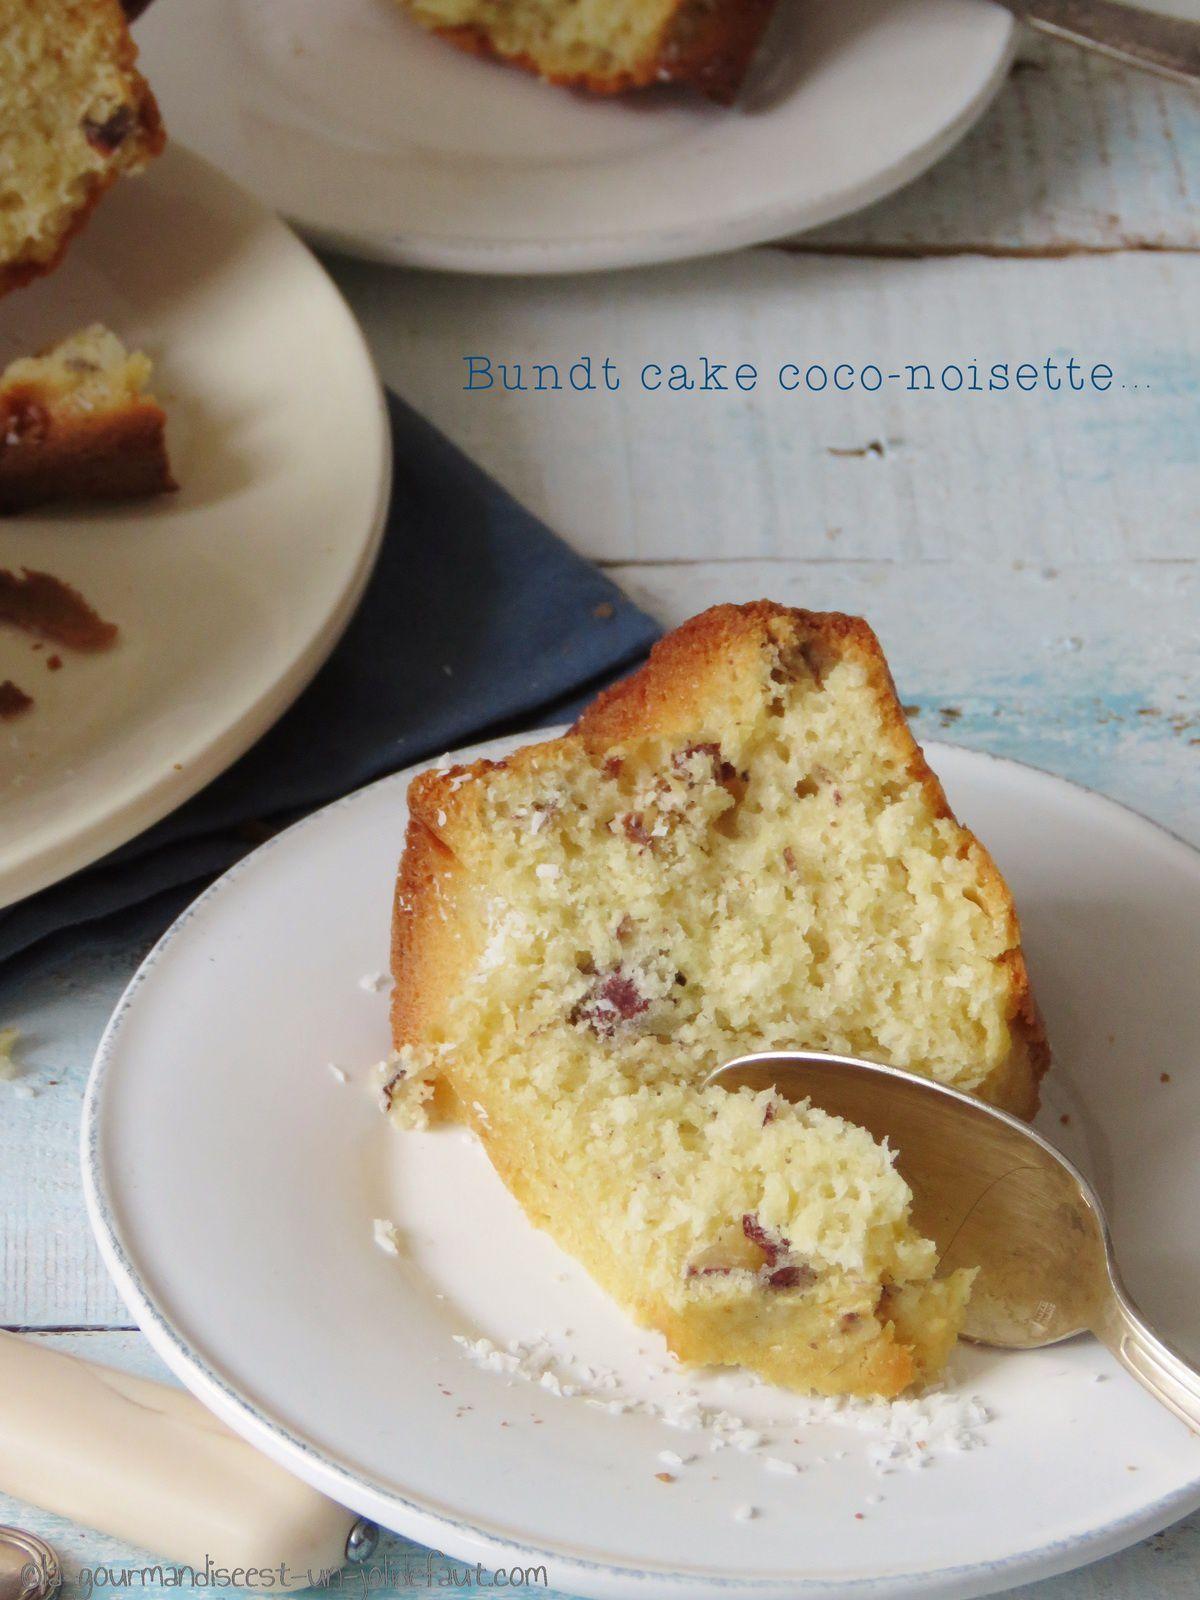 Bundt cake coco-noisette